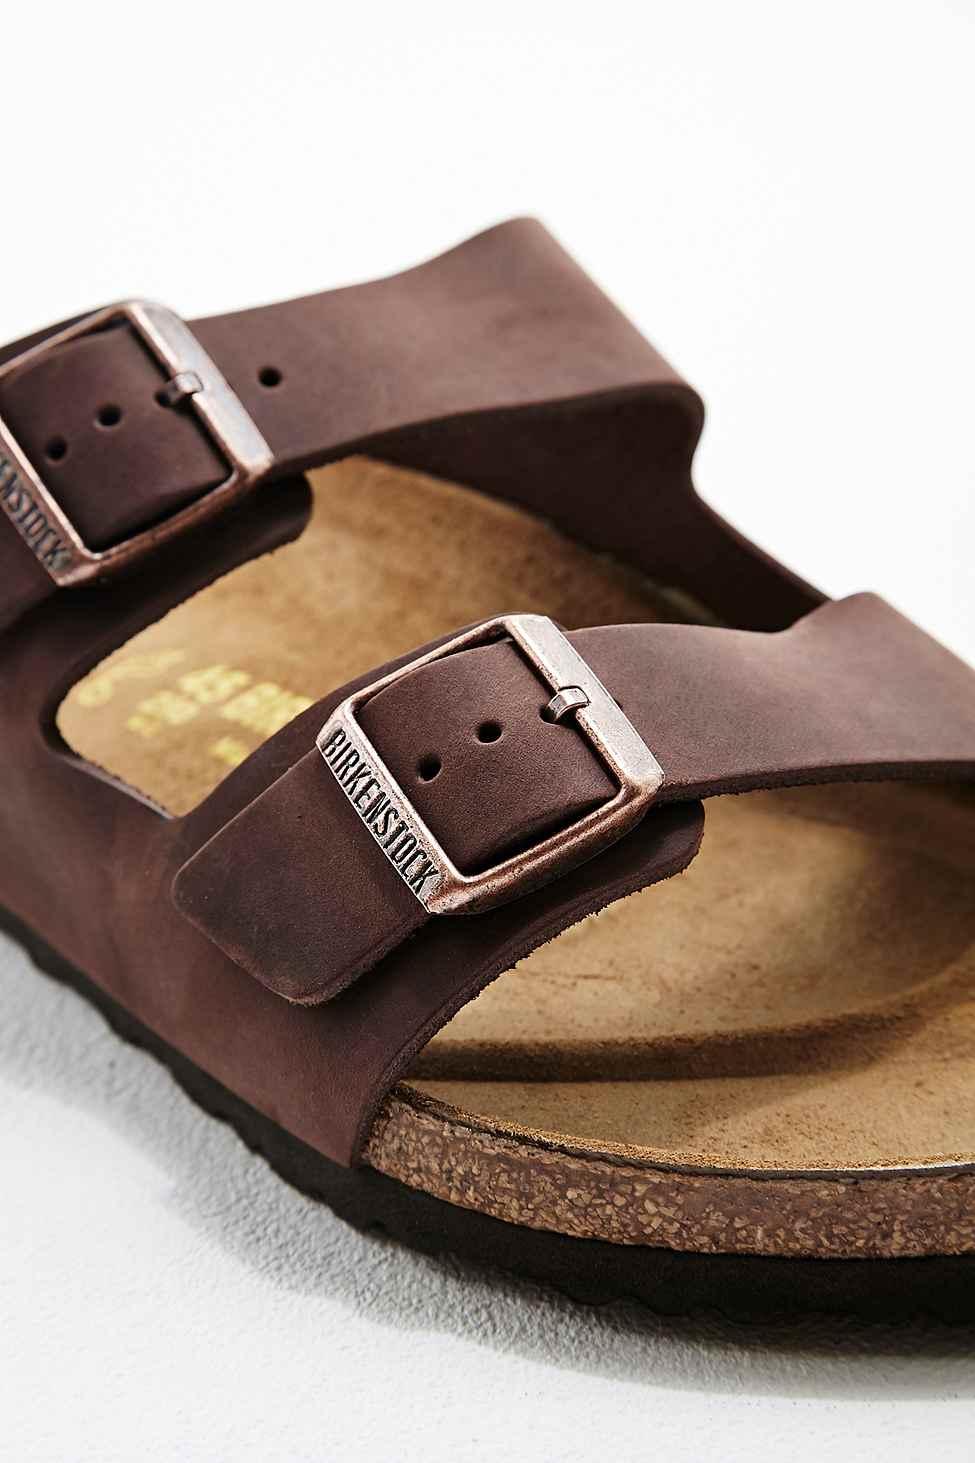 c479a4600b84 Birkenstock Arizona Habana Oiled Leather Sandals in Chocolate in ...